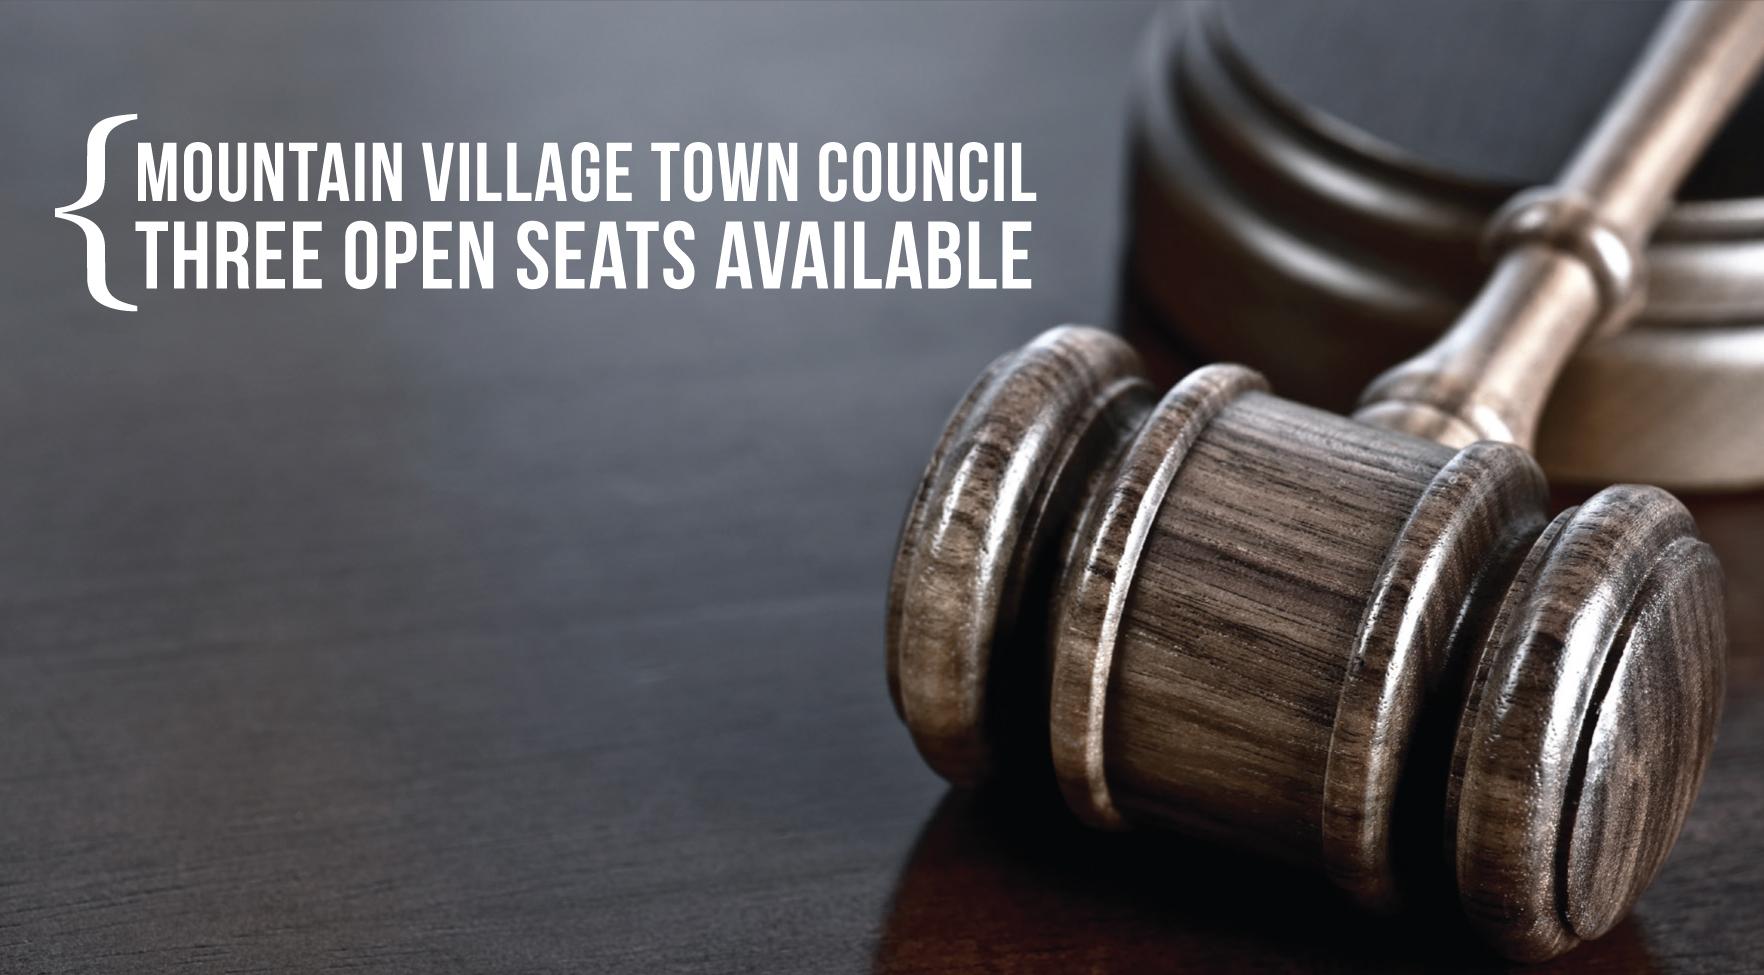 MV TC Open Seats